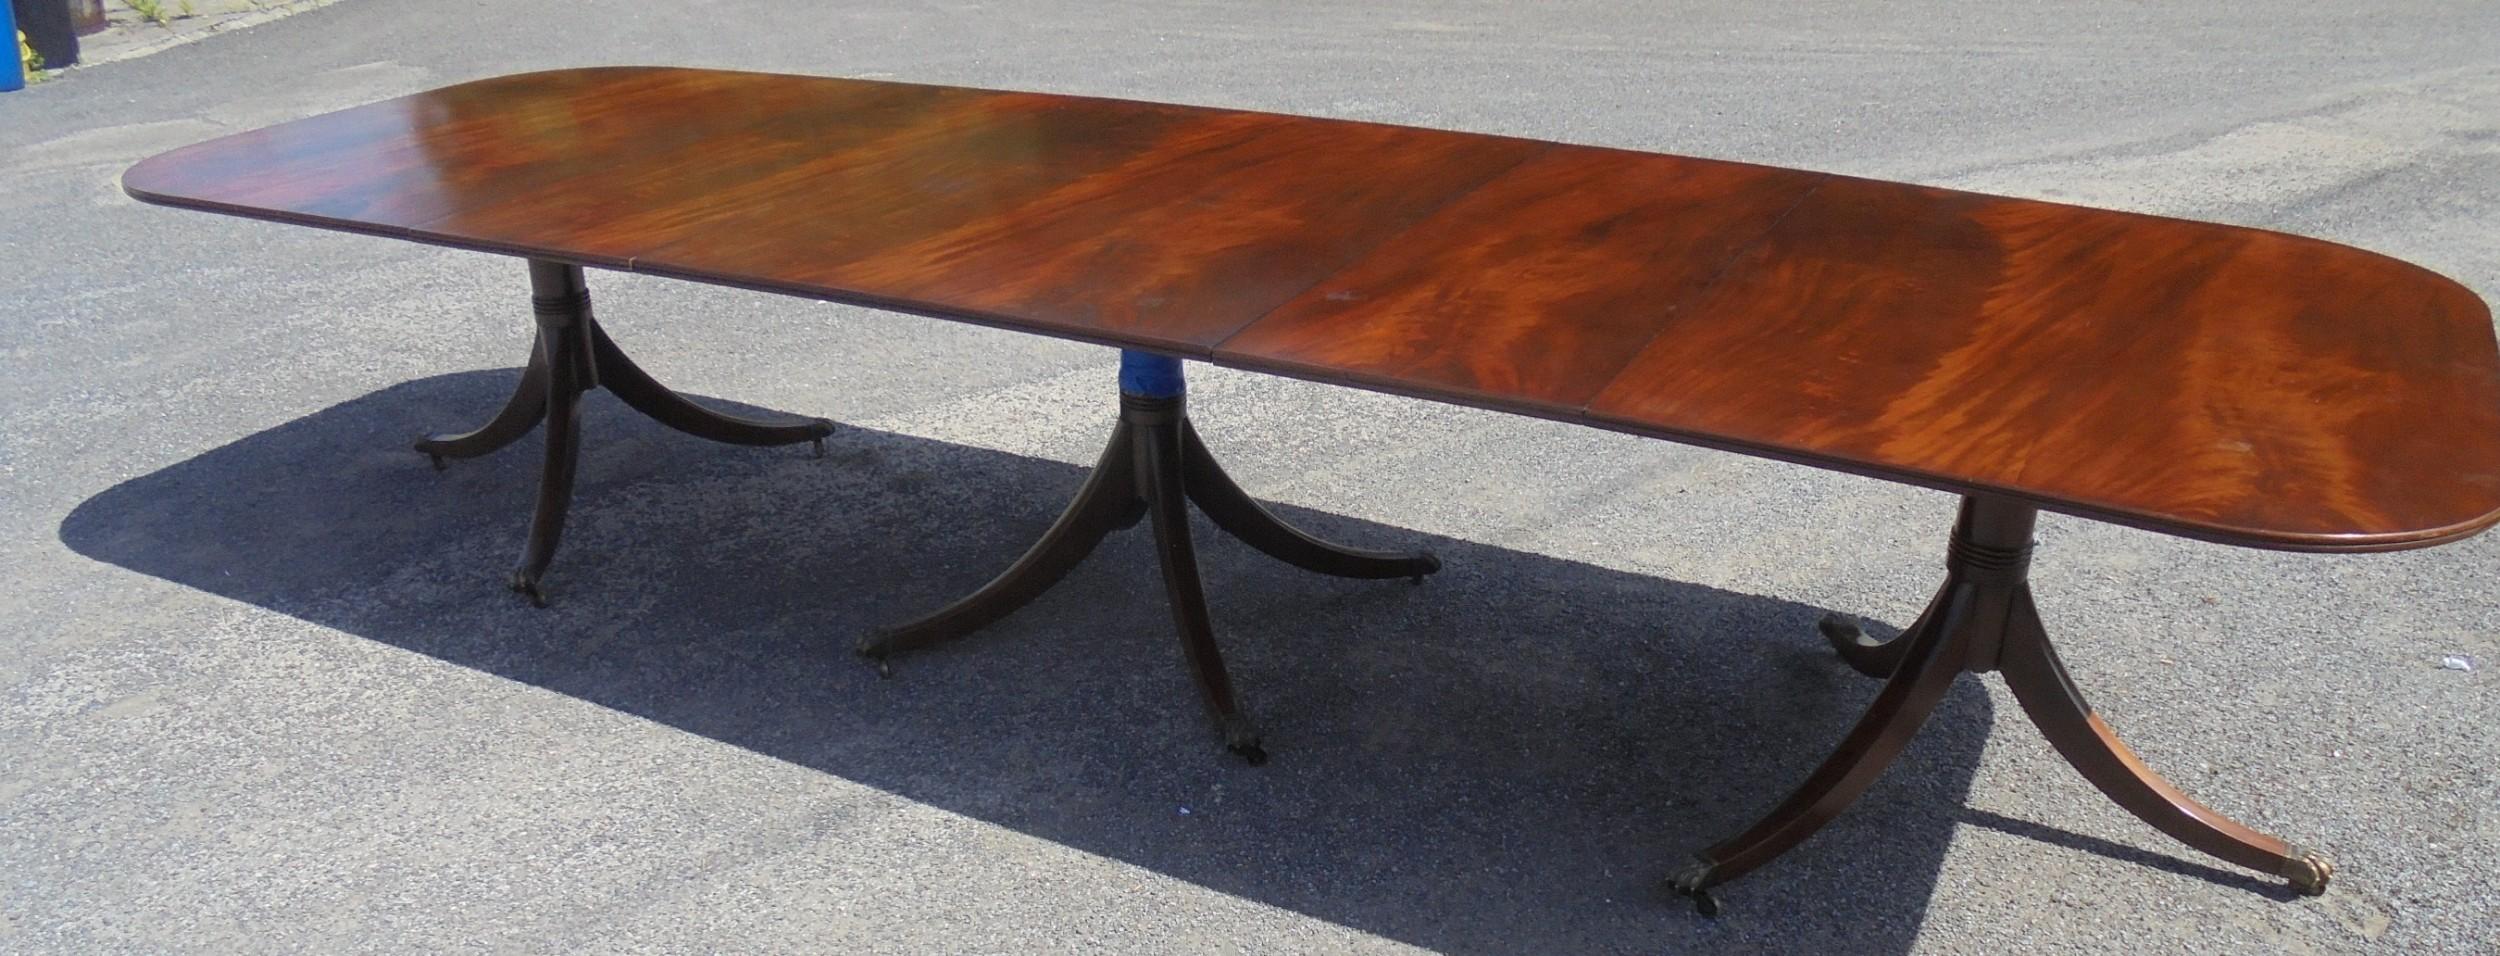 three pillar mahogany dining table seats fourteen plus